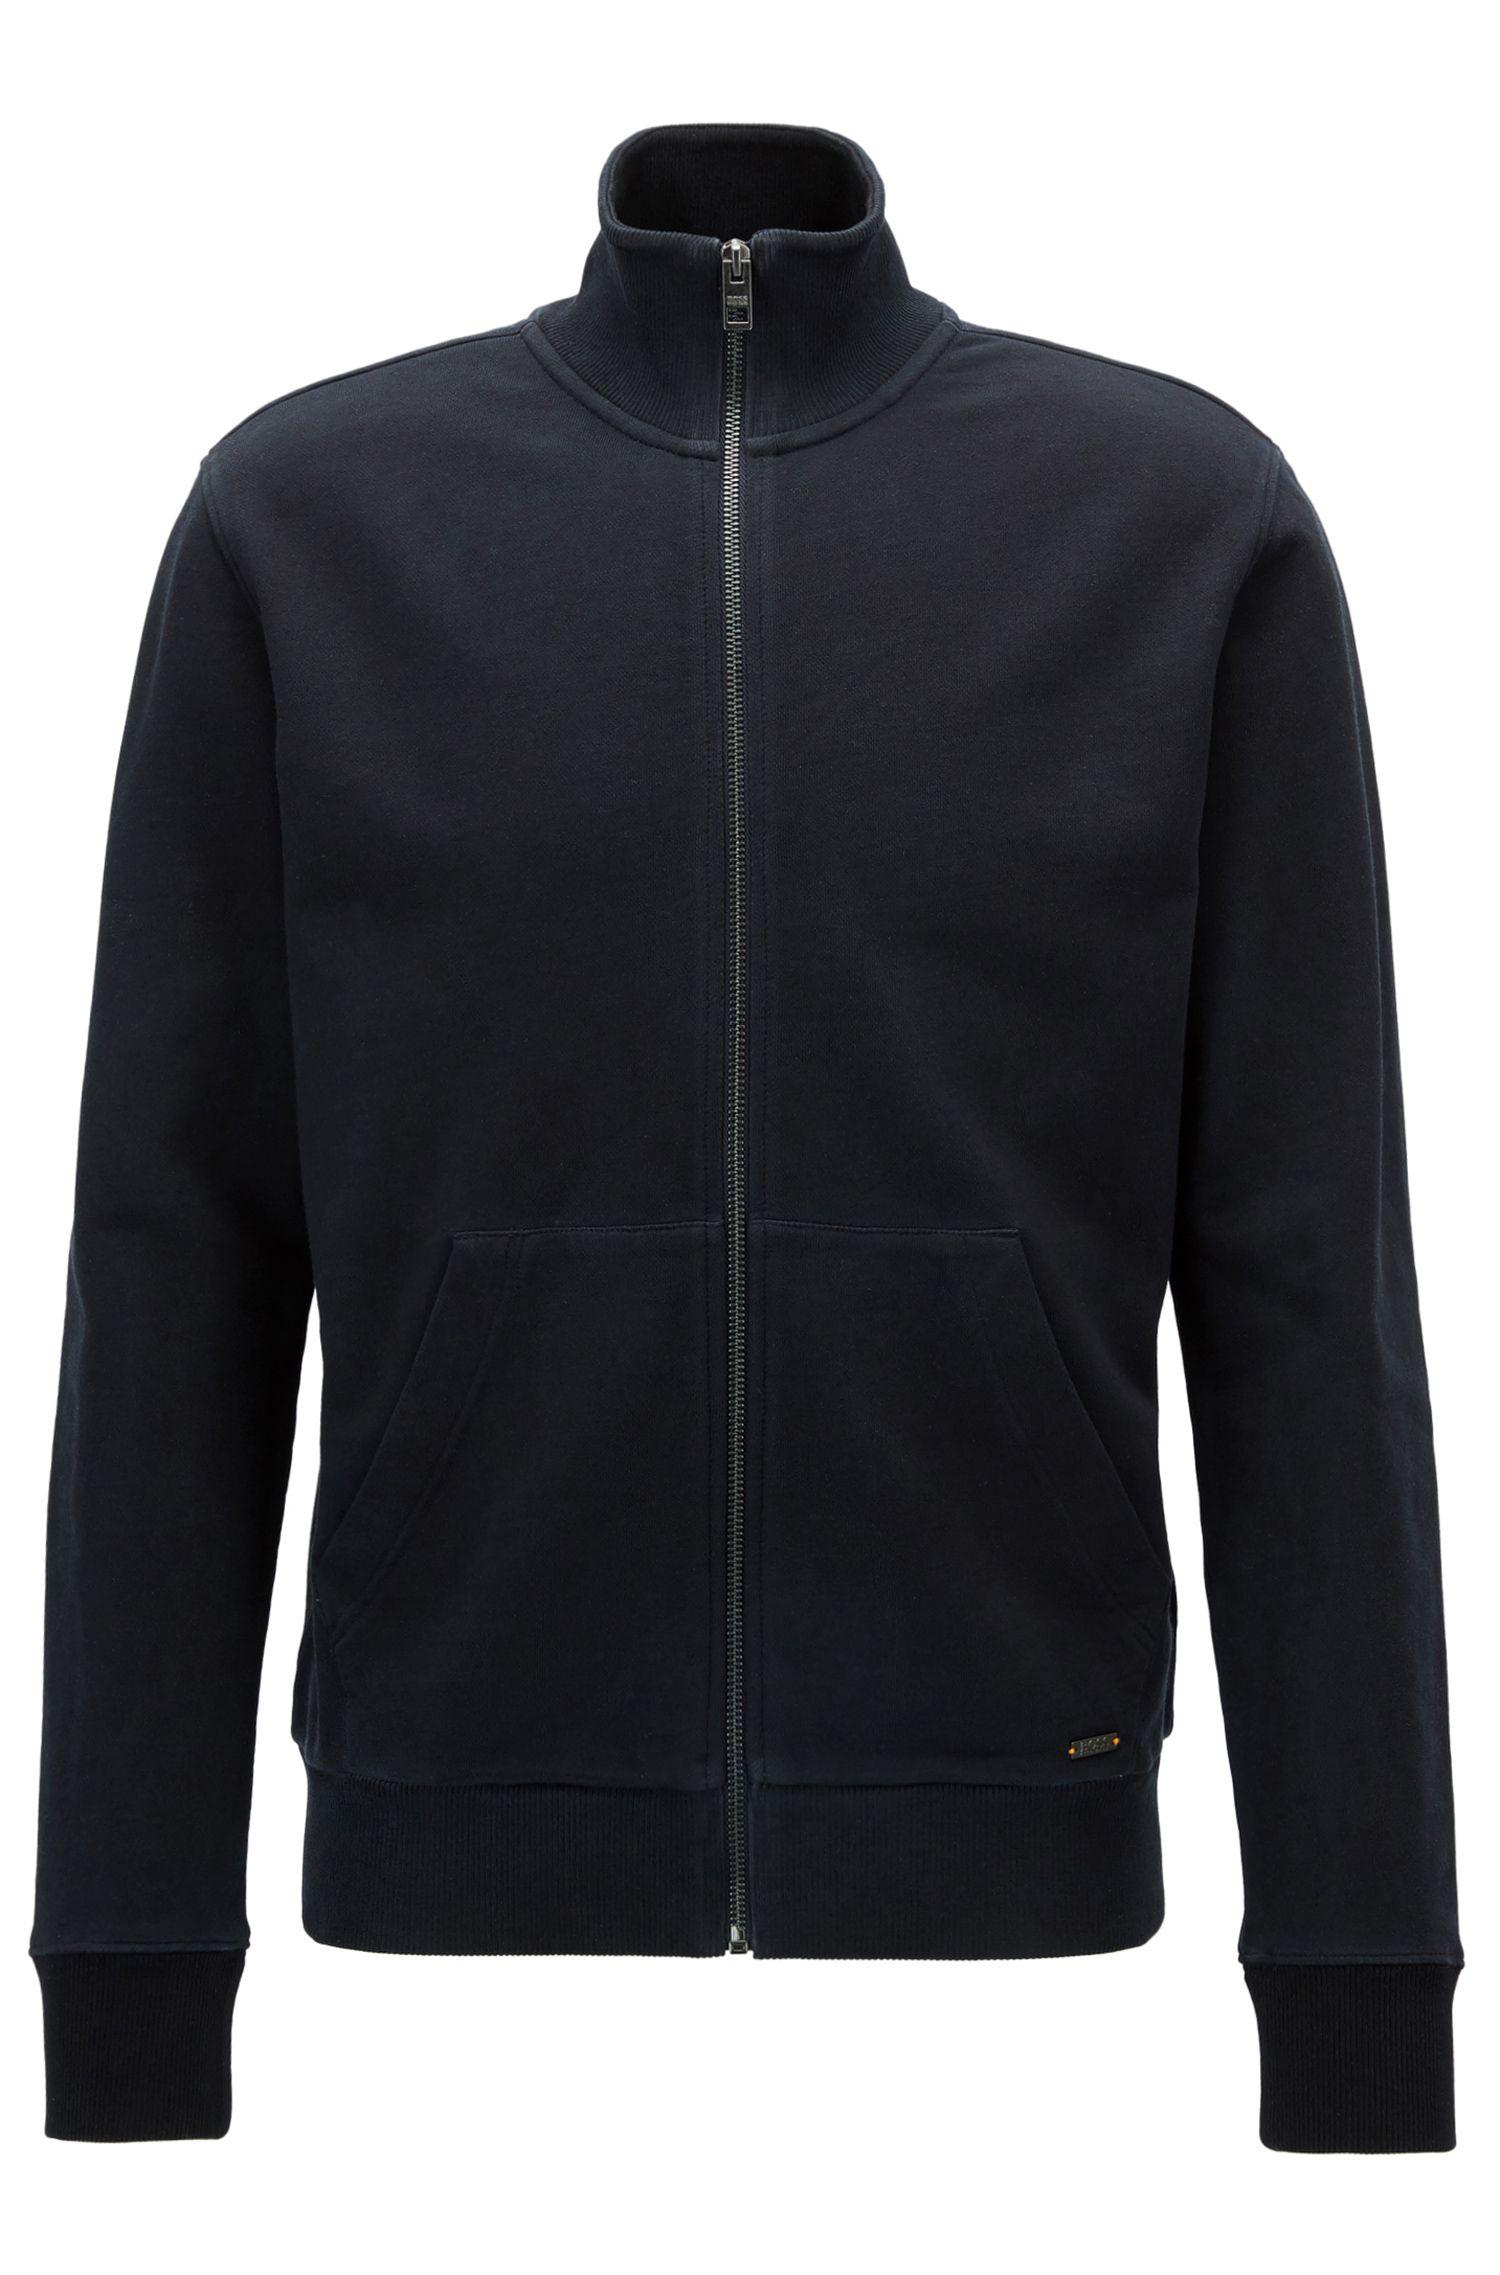 Regular-fit zip-through jacket in pure cotton